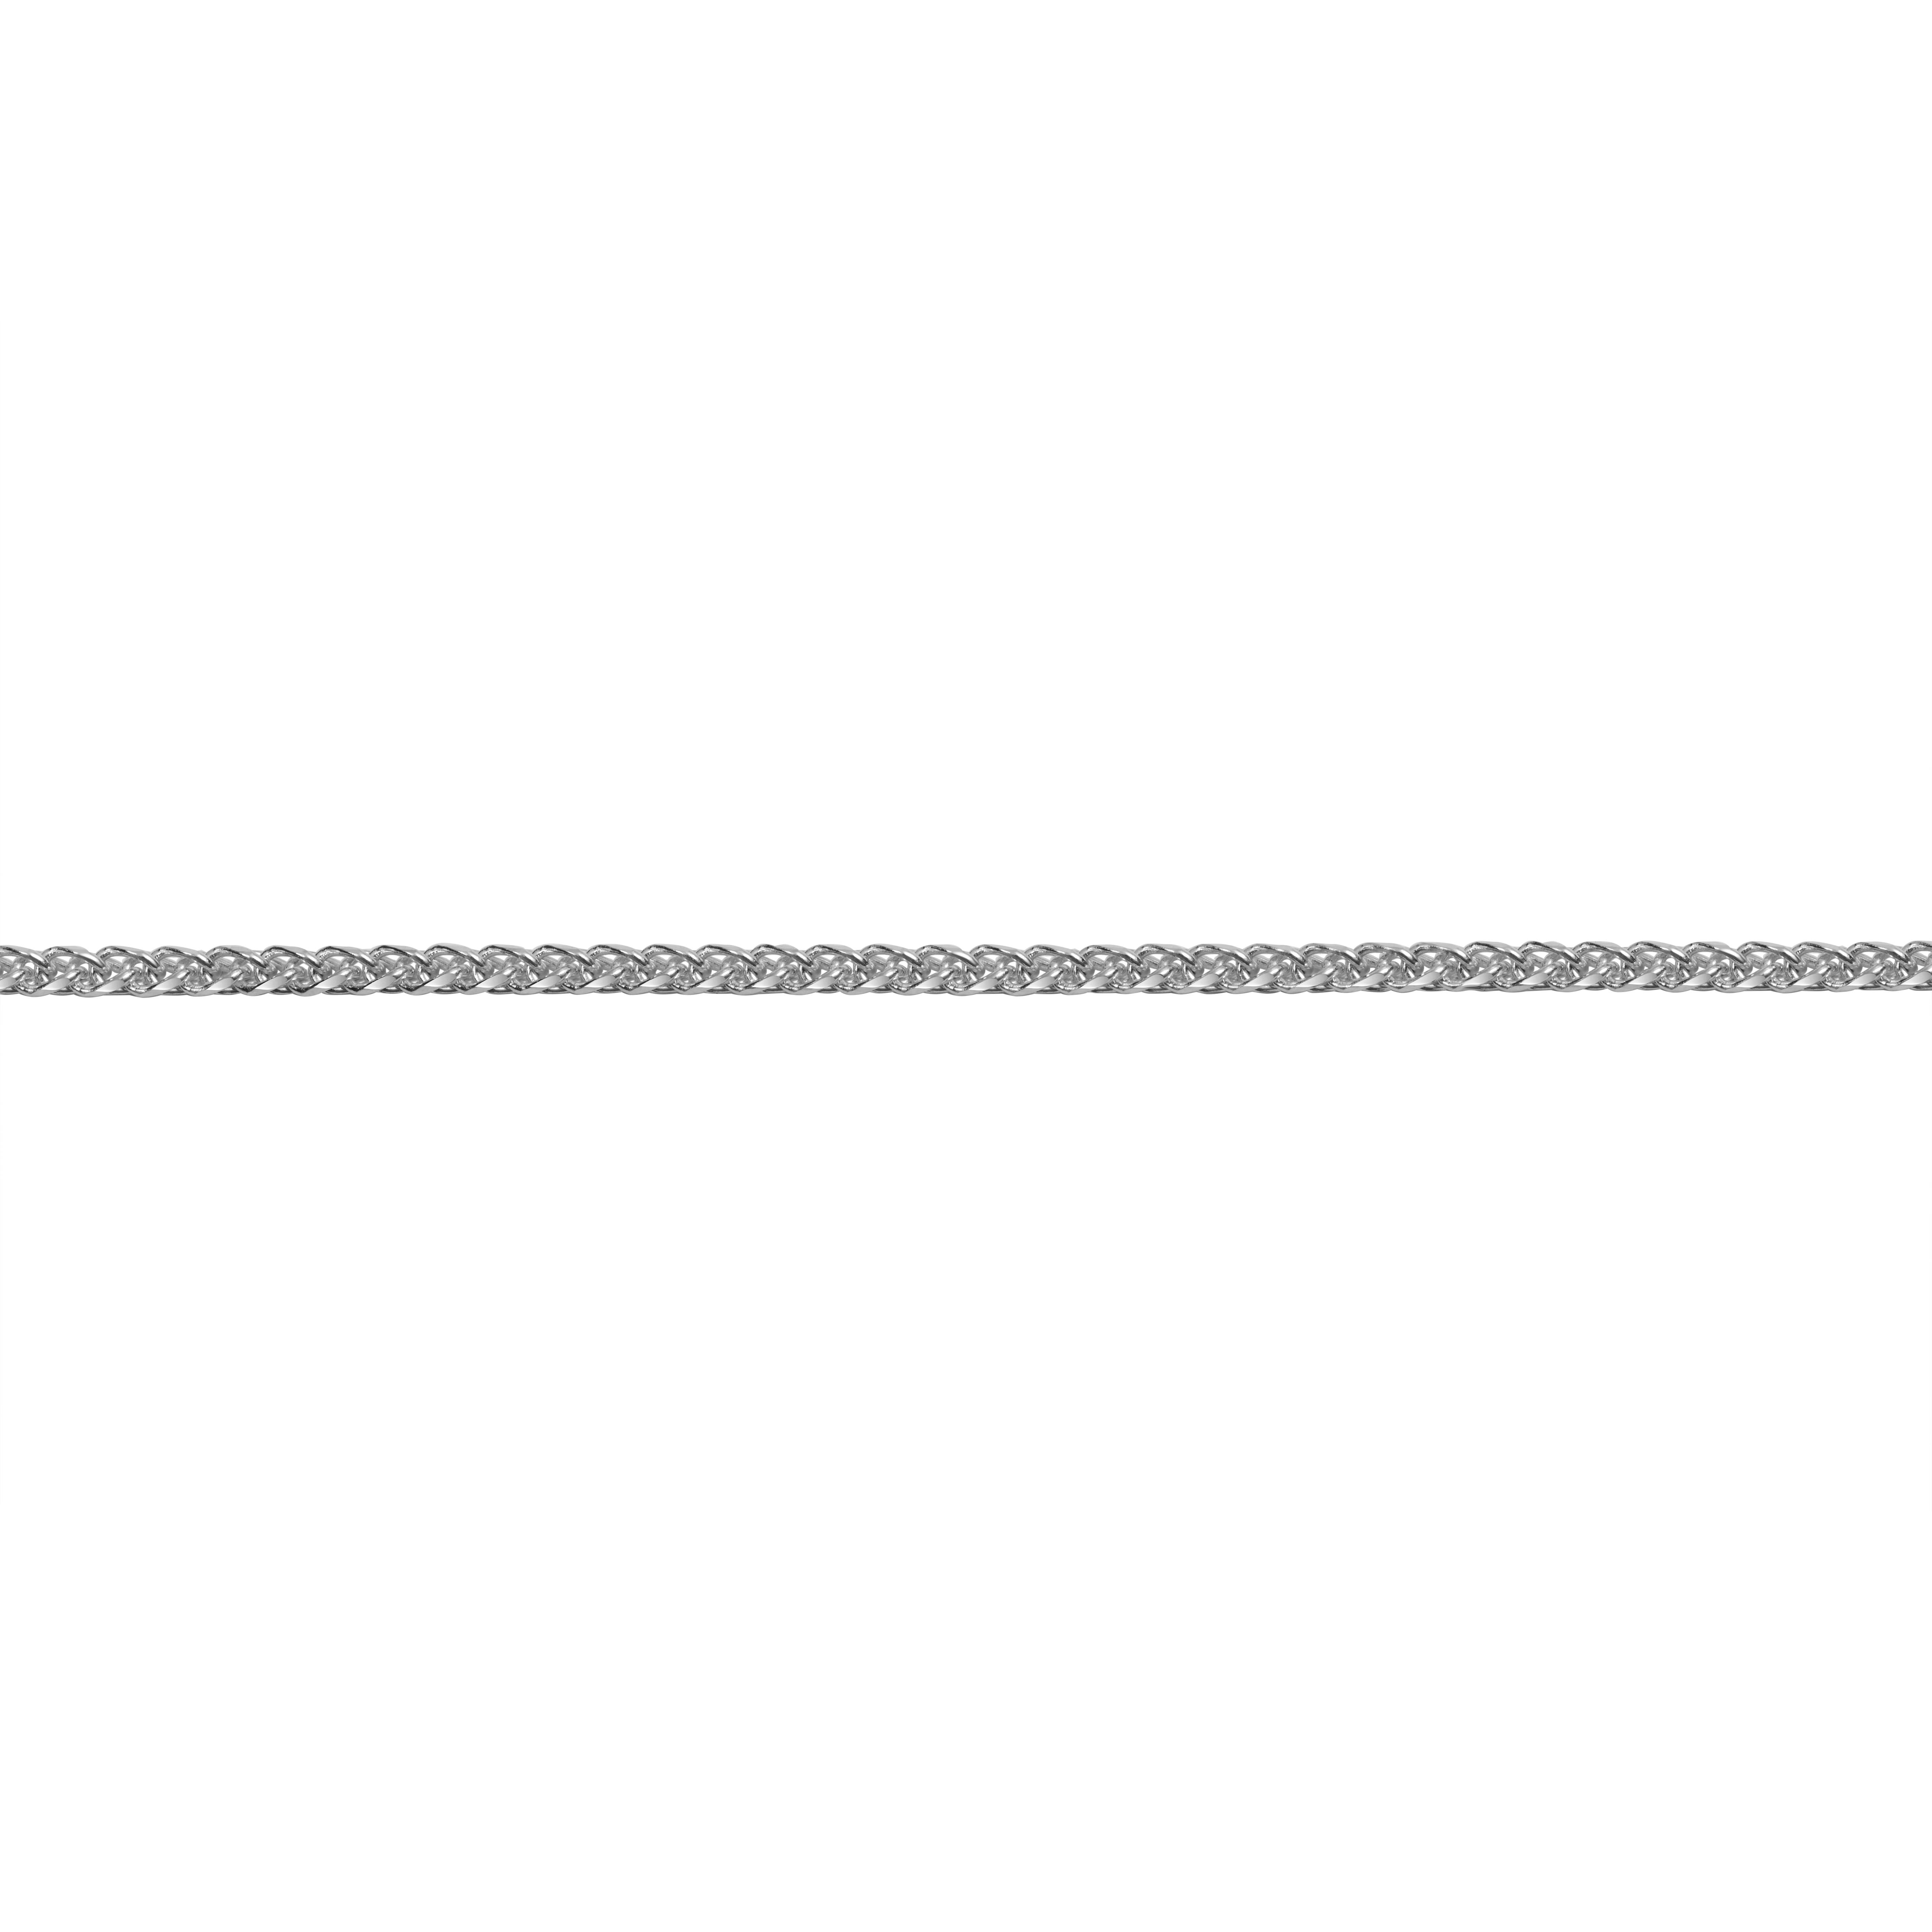 Bracelet 7.5'' coupe diamant - Or blanc 10K